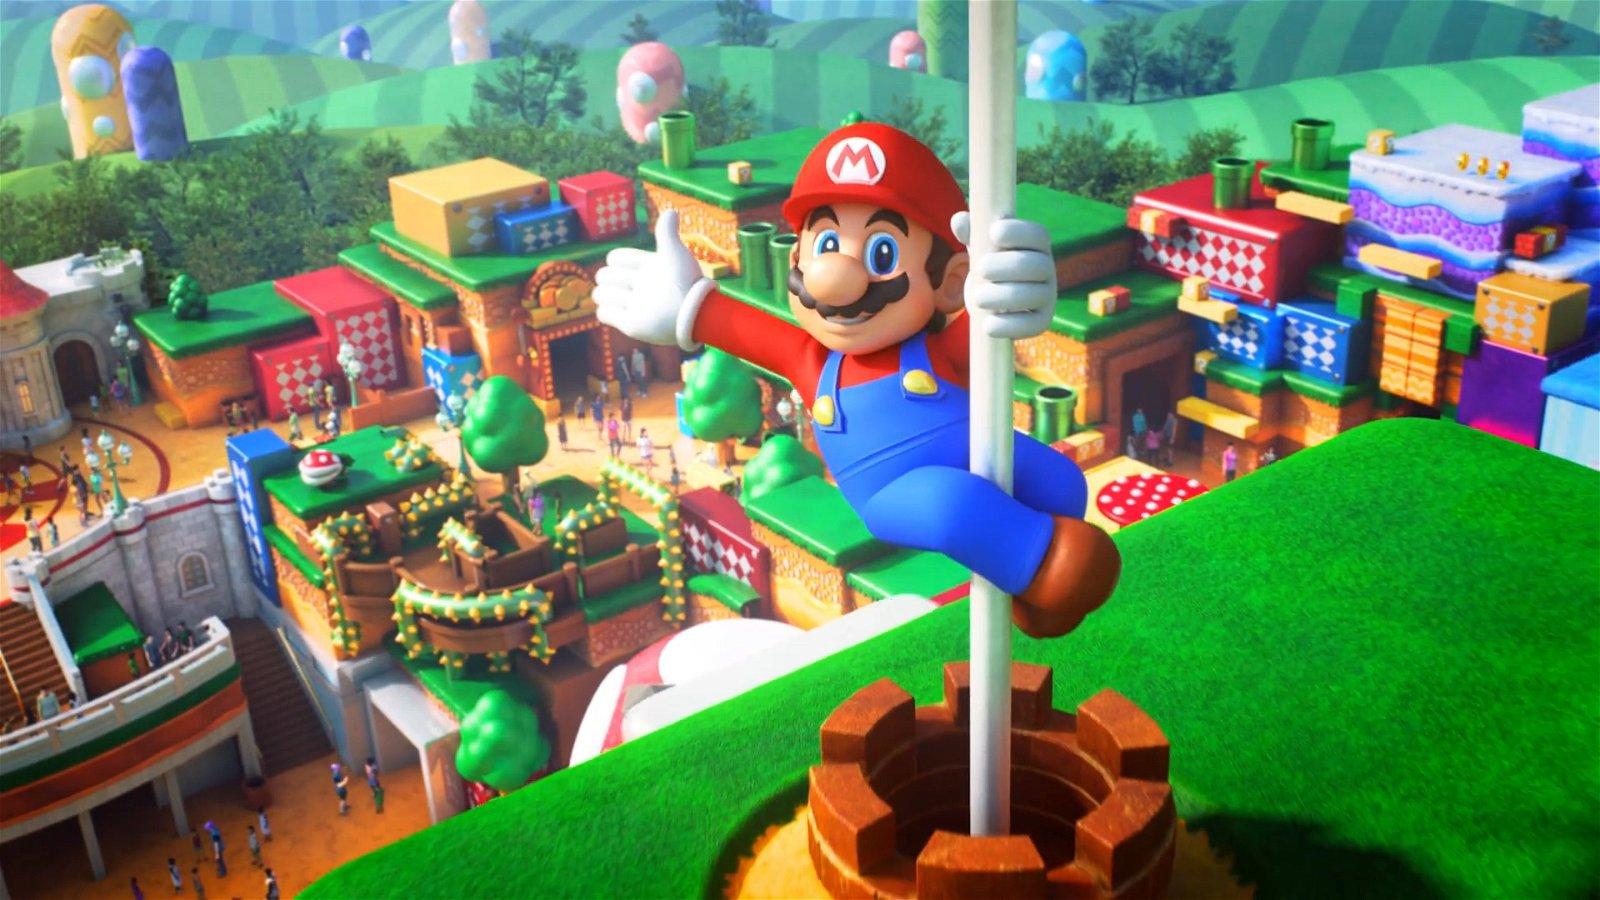 Take the Warp Pipe to Super Nintendo World February 4